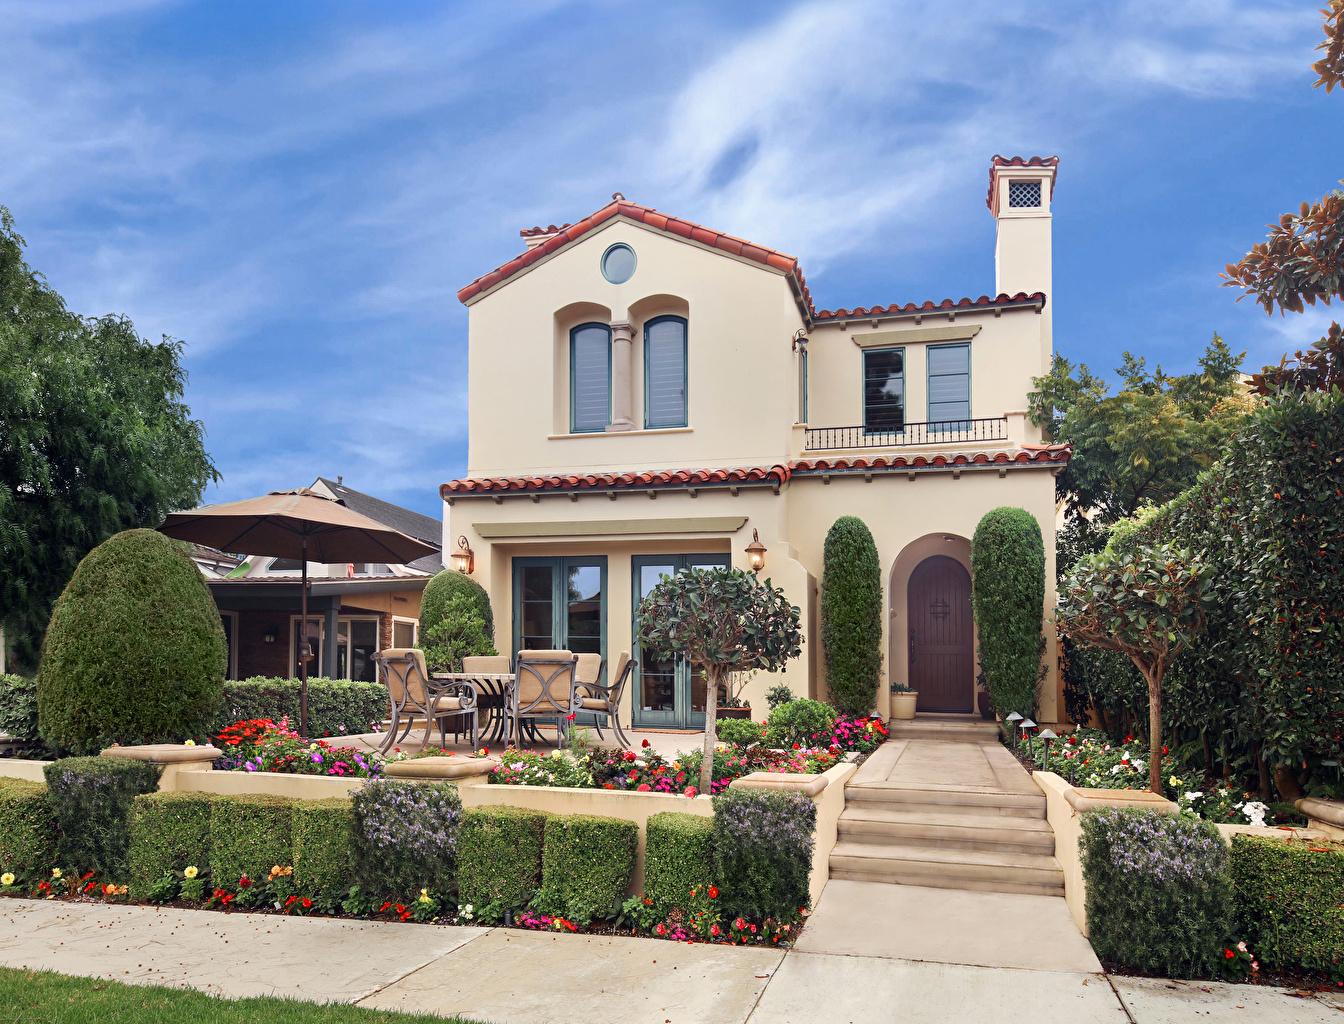 Images USA Newport Beach Mansion Houses Shrubs Cities Design Bush Building